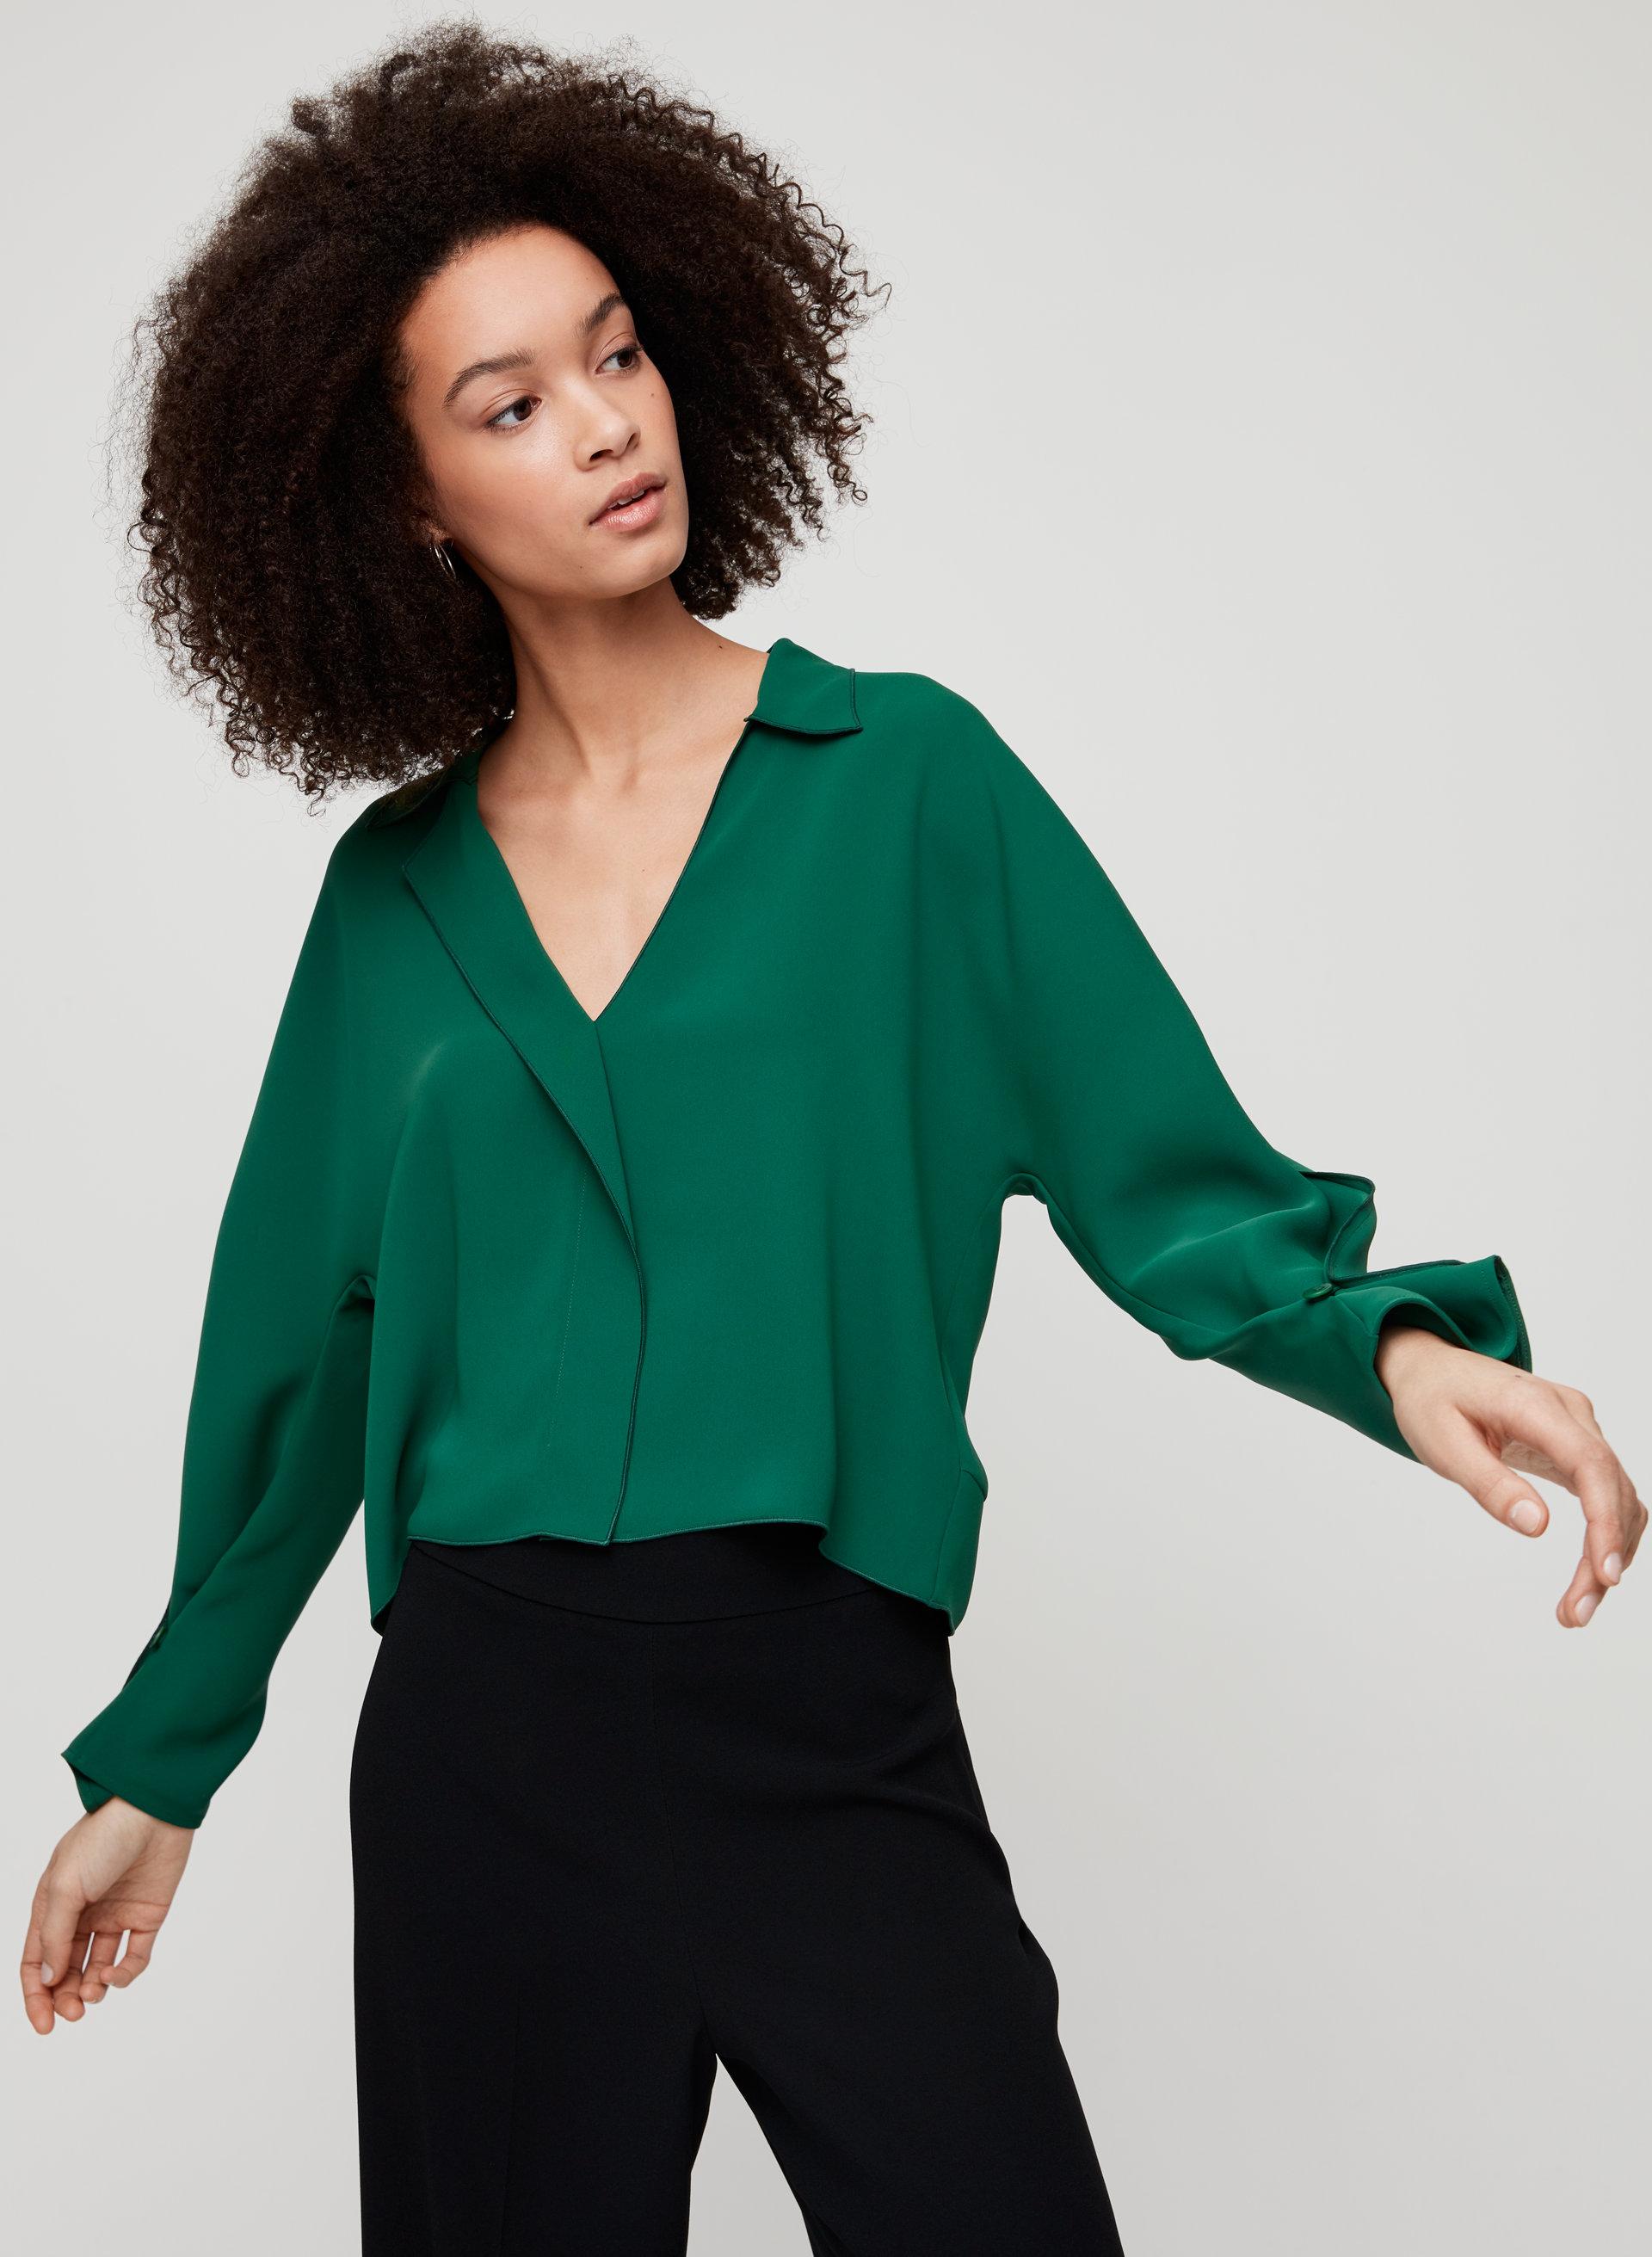 9a838b723955ec martin blouse Cropped, V-neck blouse